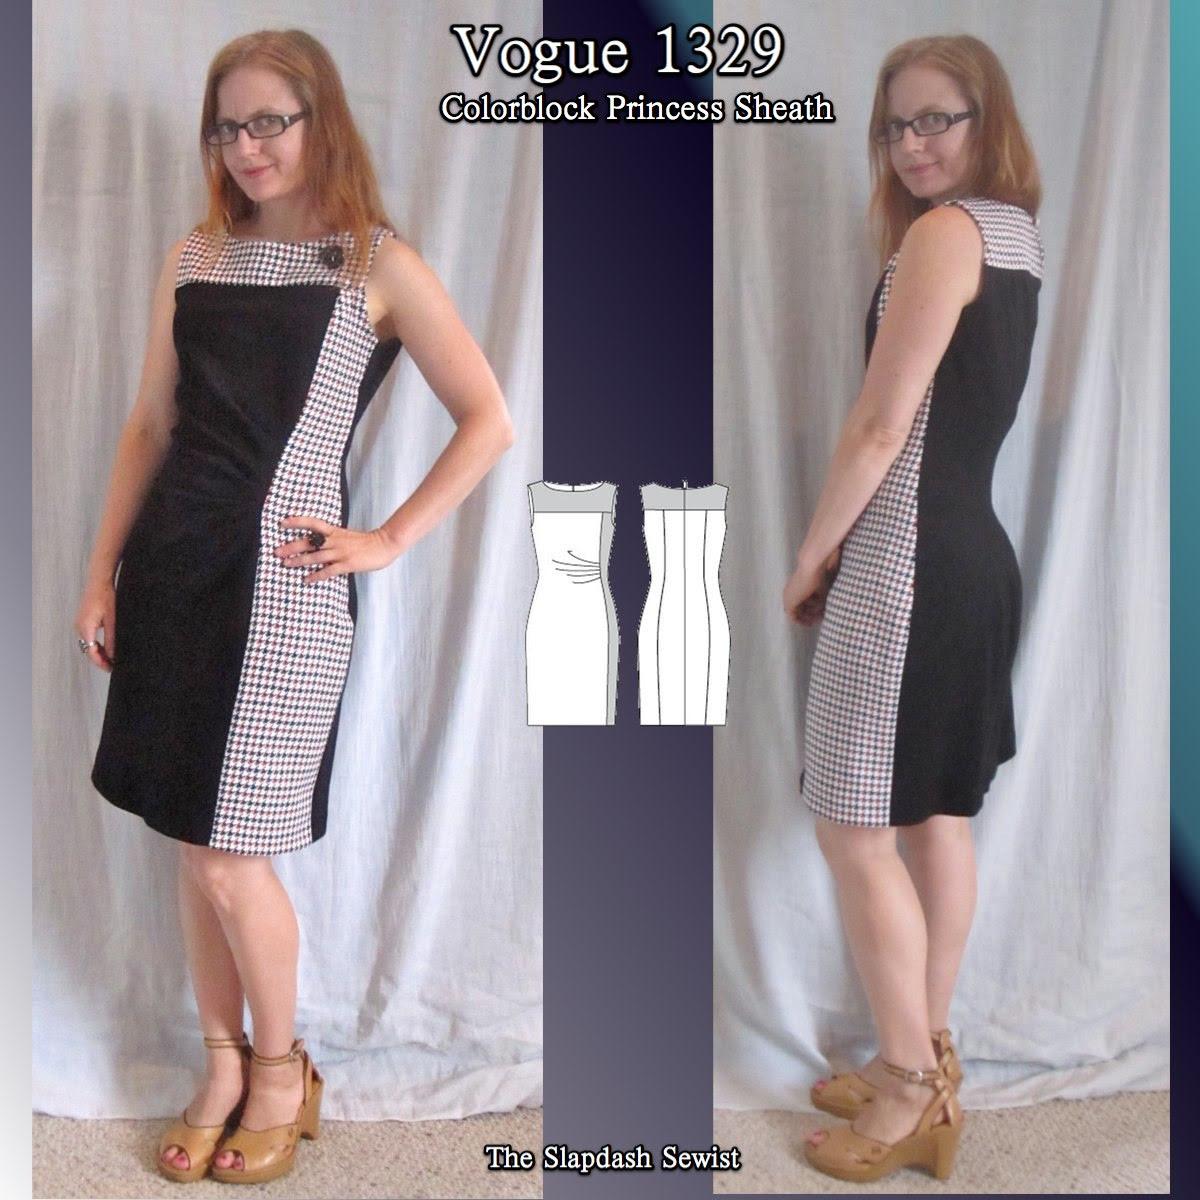 Vogue 1329 Thumbnail